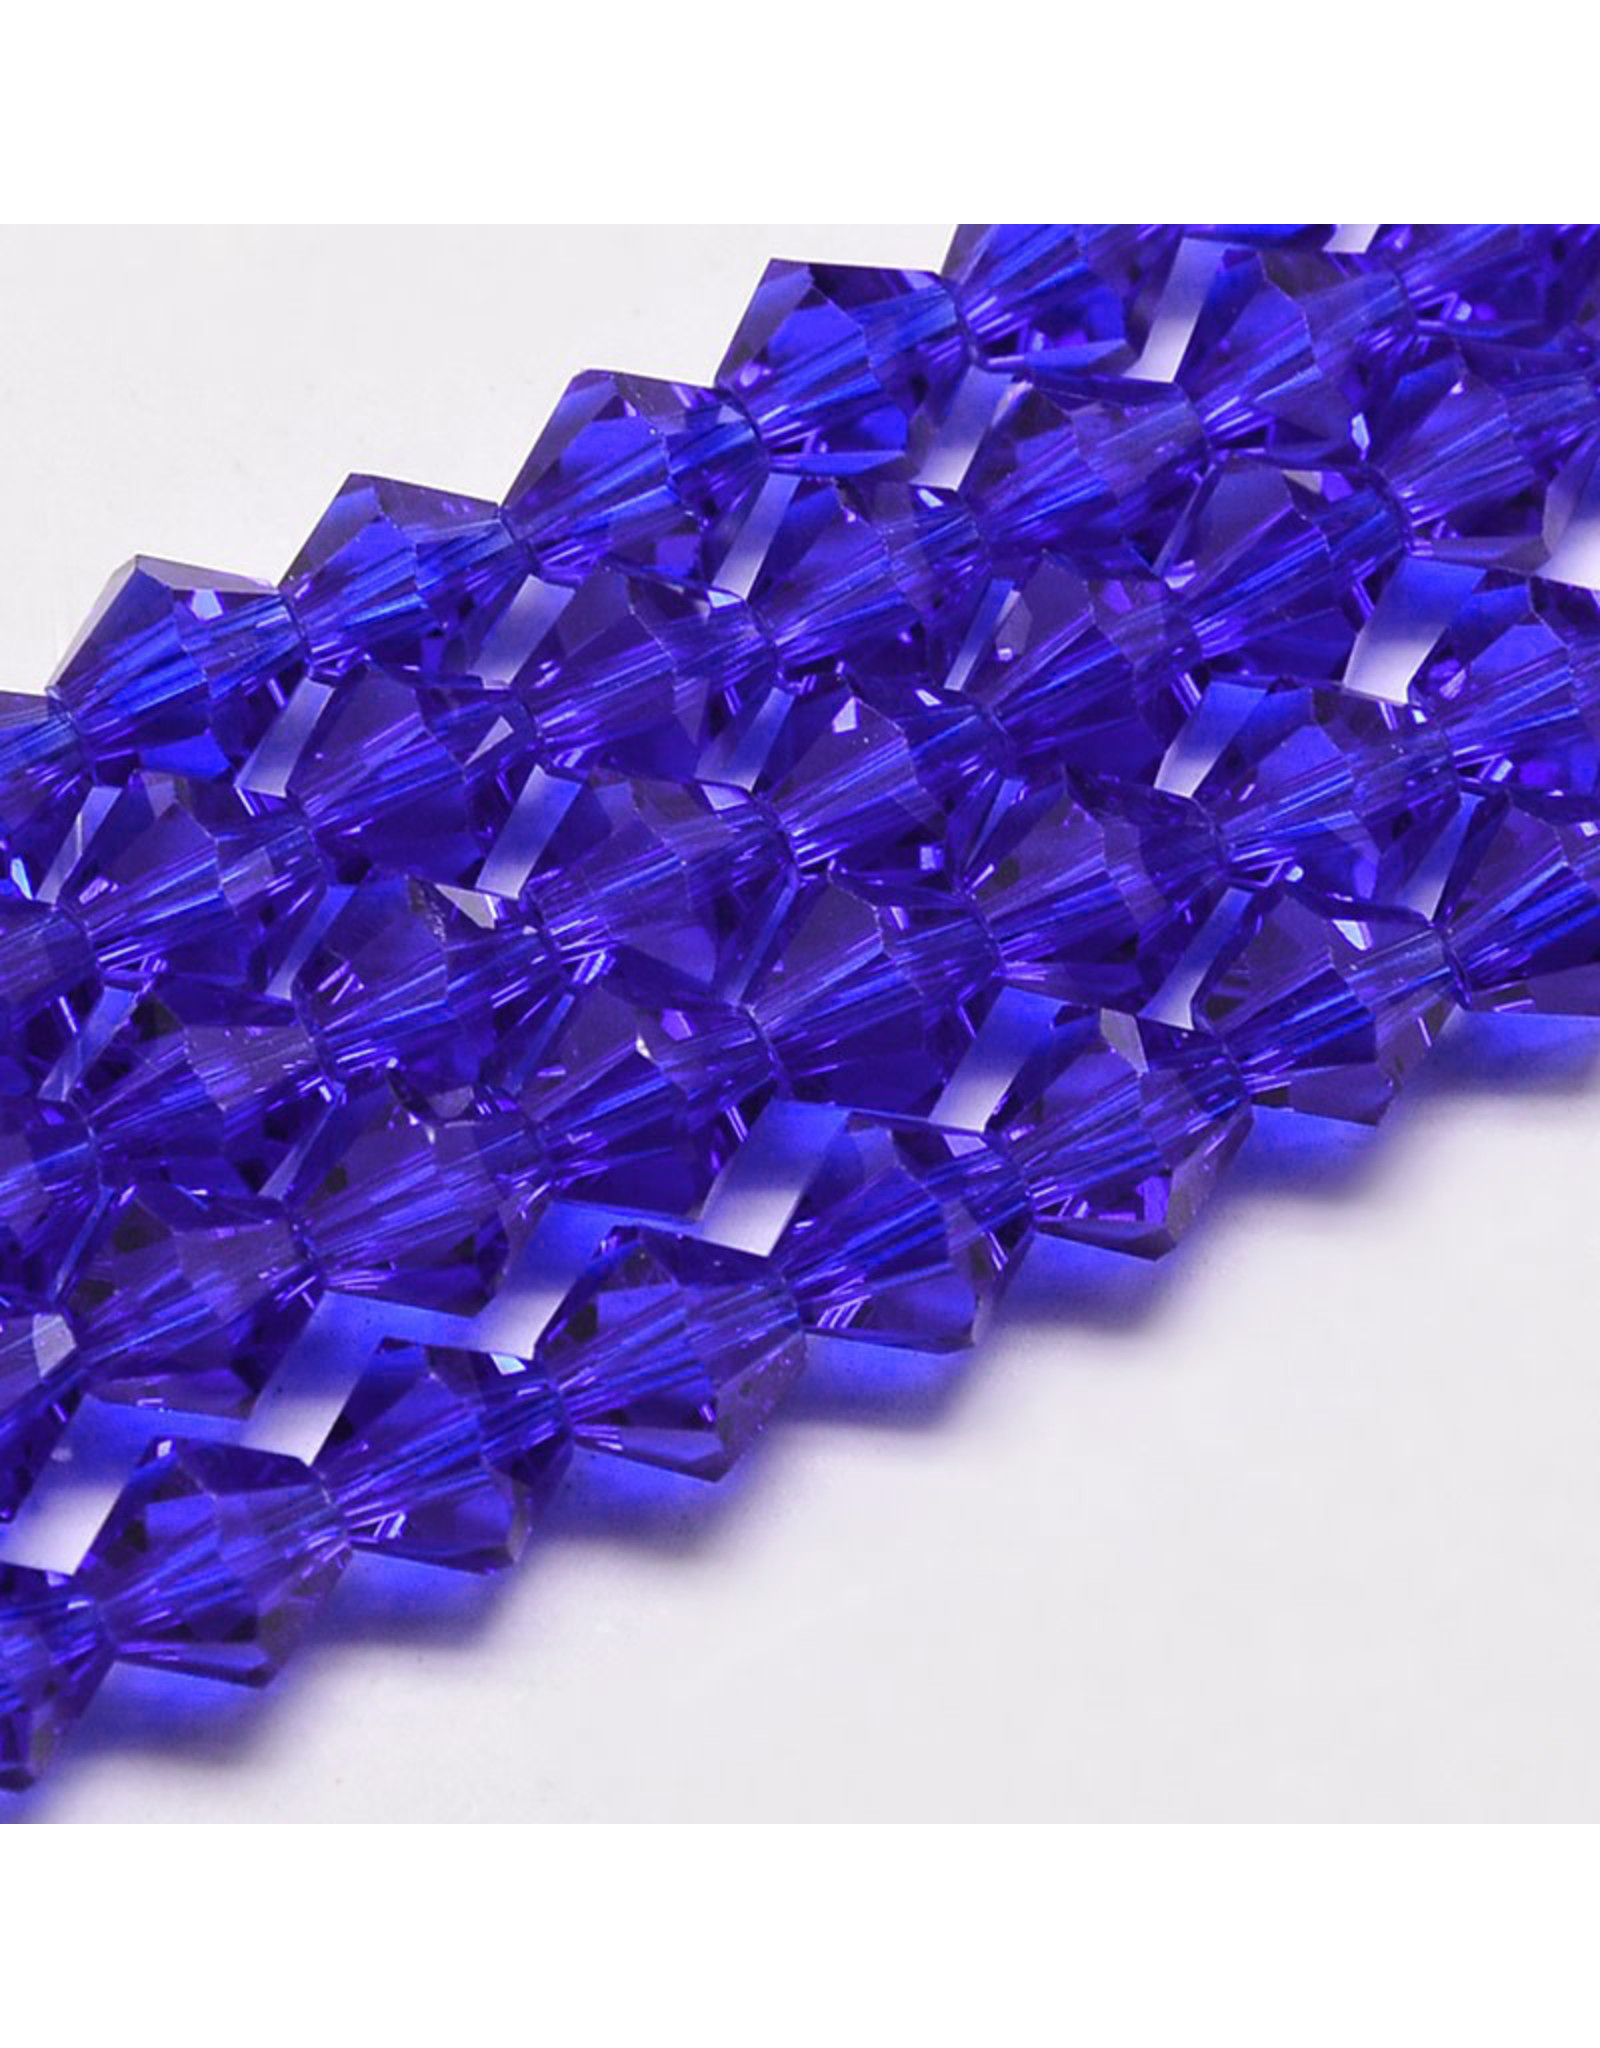 4mm Bicone Dark Sapphire Blue   'AA'  Grade  x95